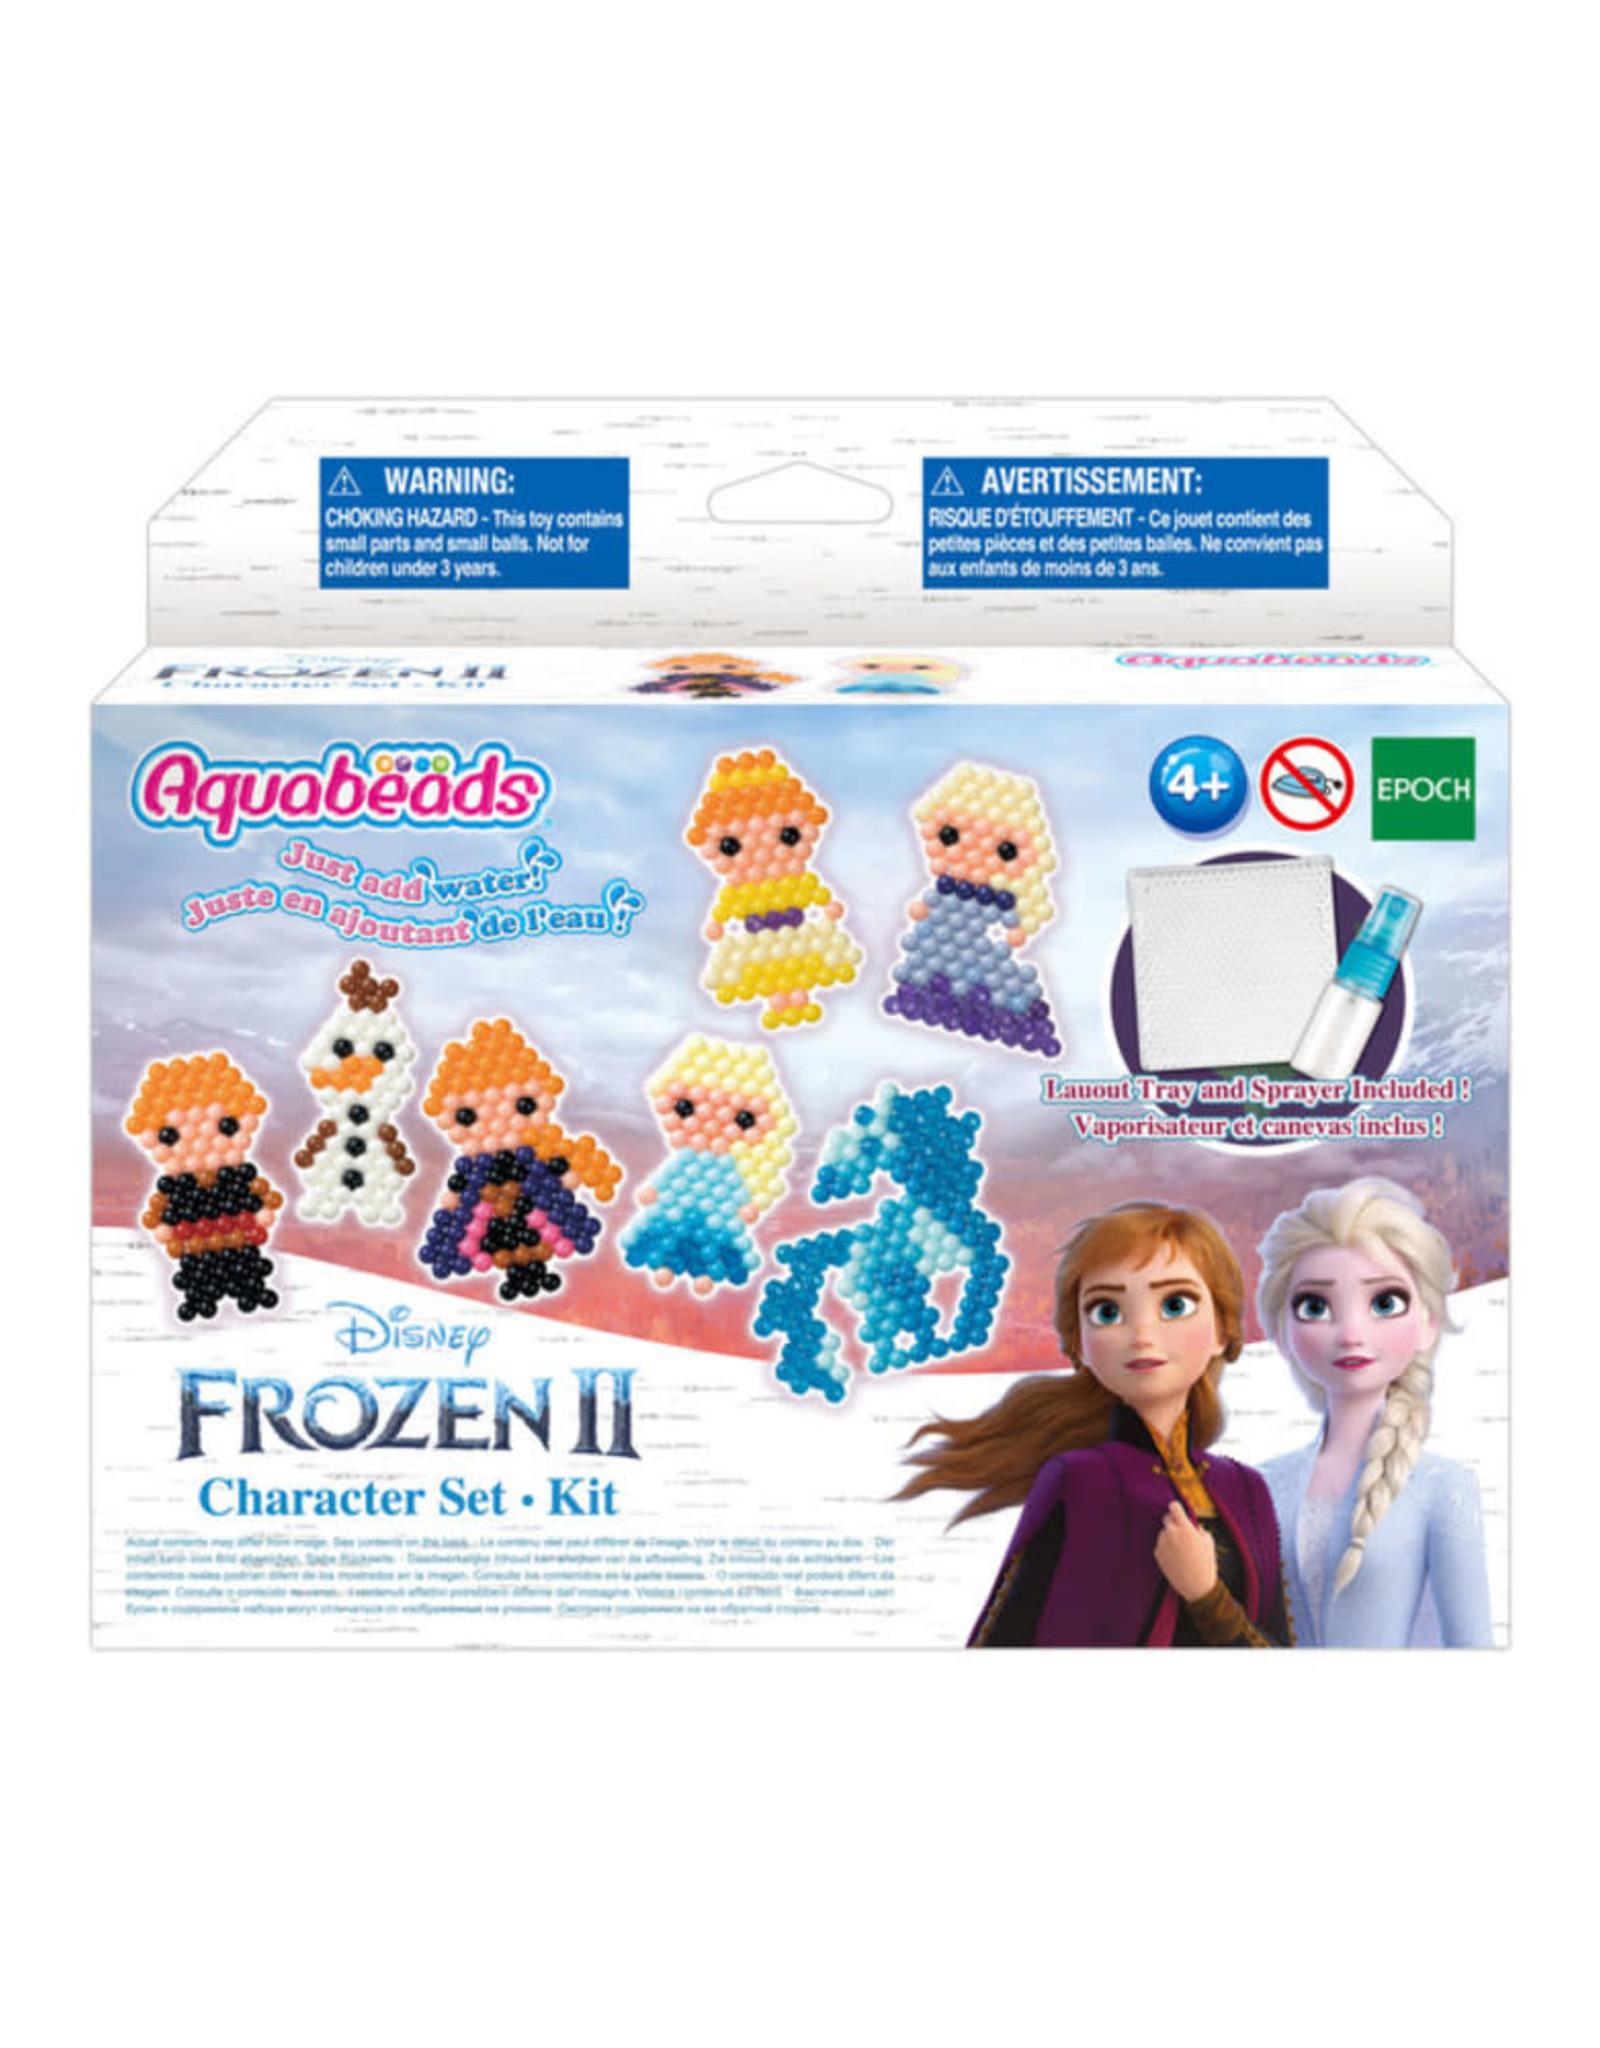 Aquabeads Aquabeads Frozen II Character Set